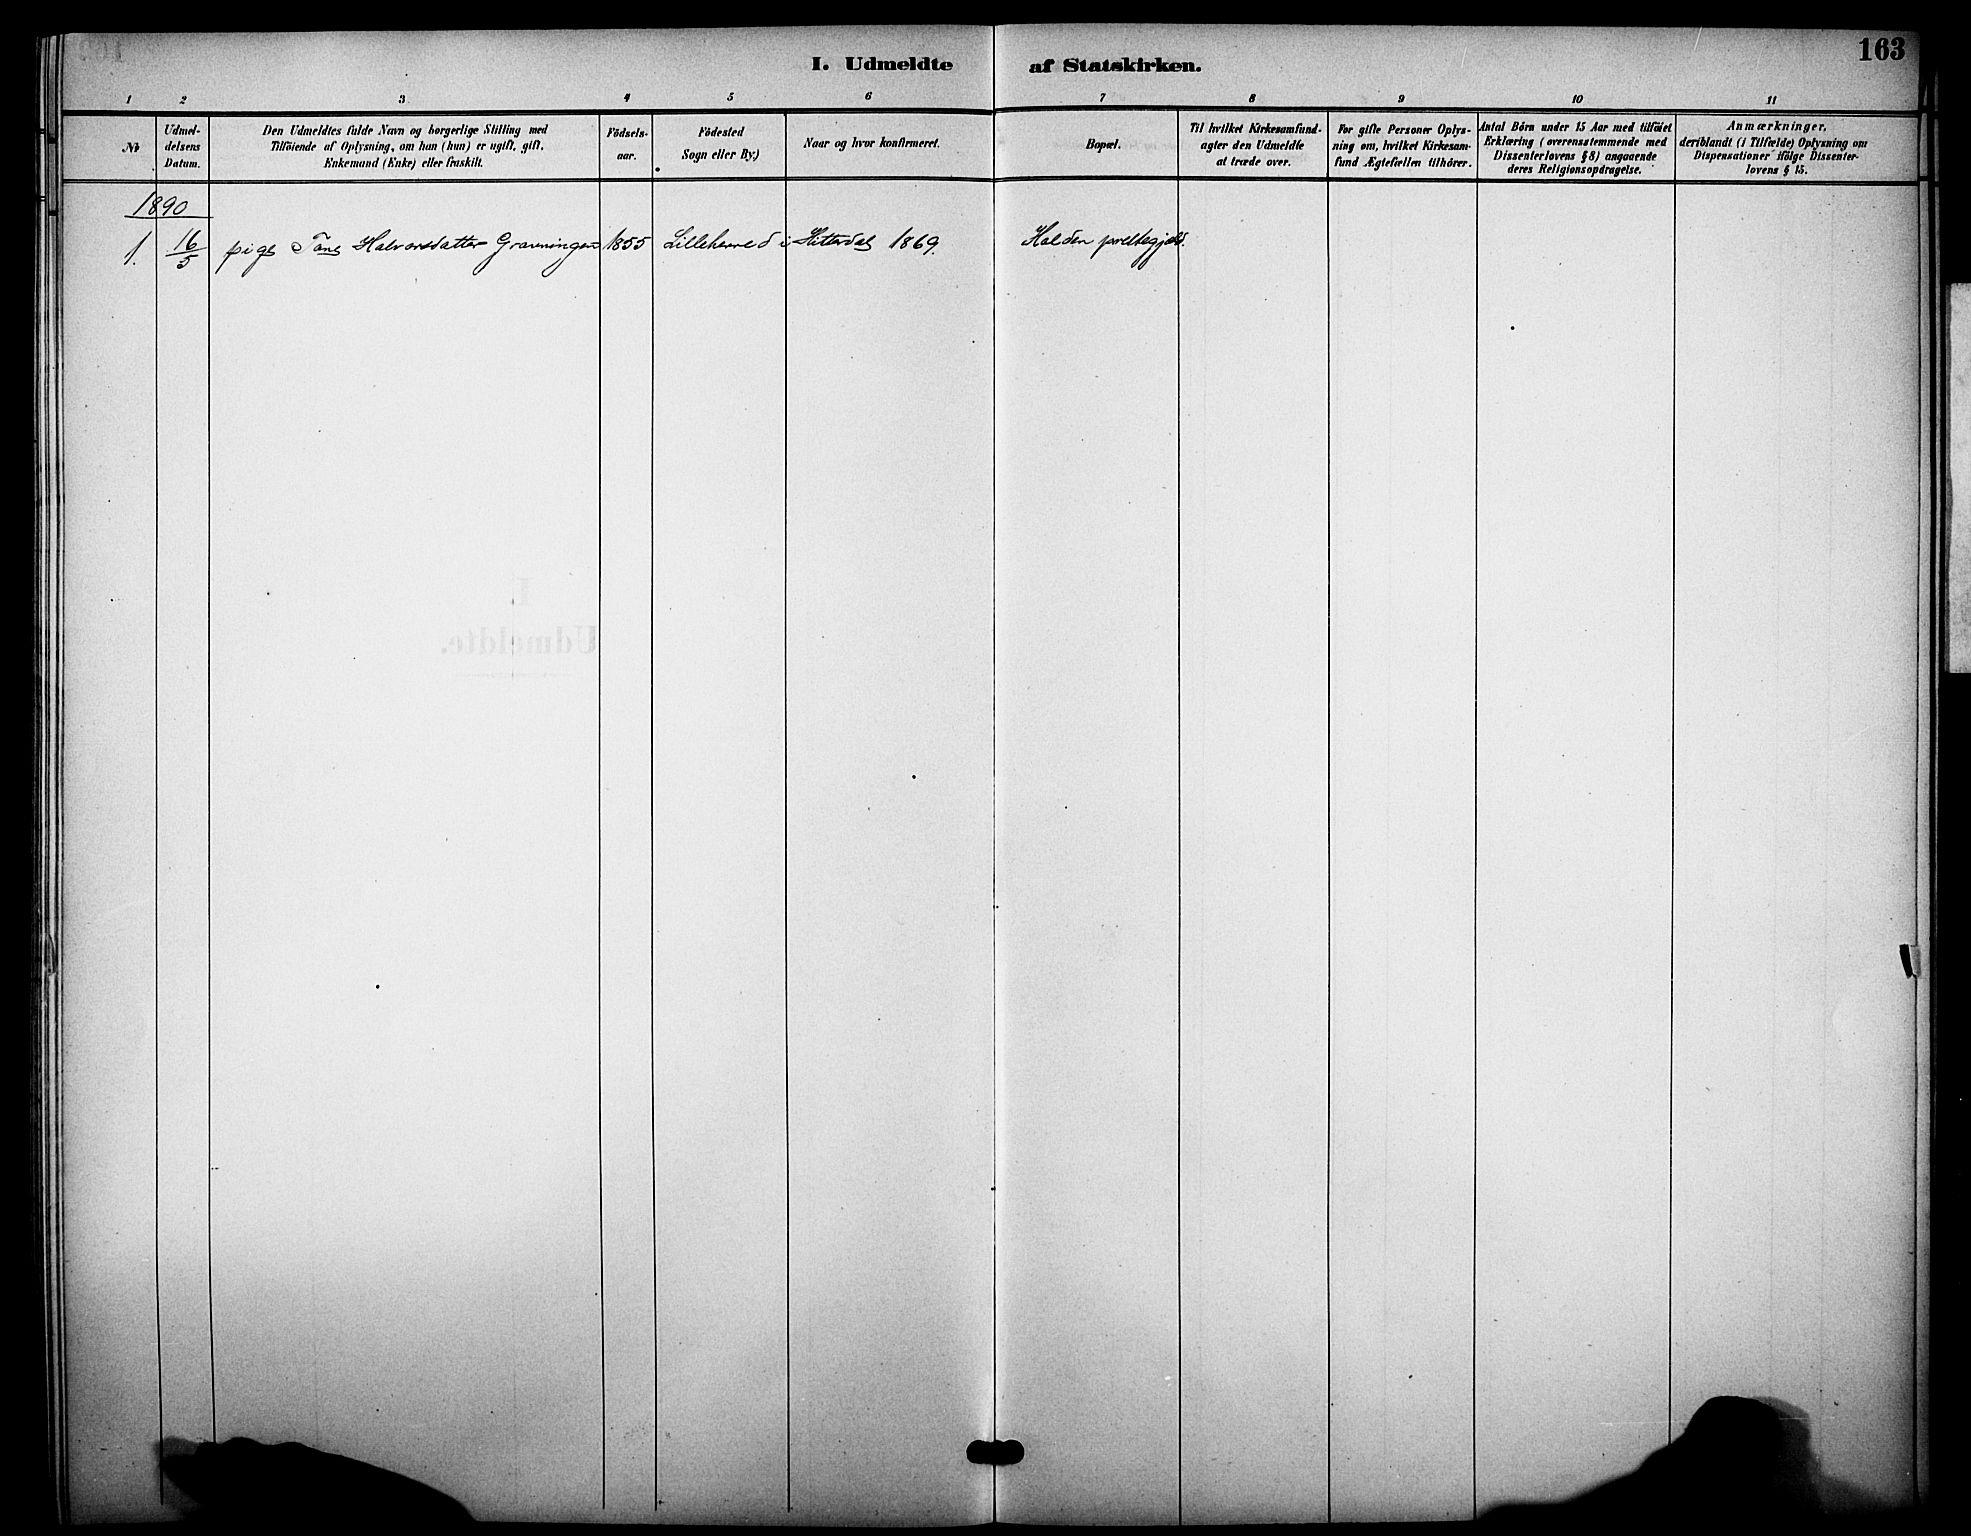 SAKO, Heddal kirkebøker, F/Fb/L0001: Ministerialbok nr. II 1, 1884-1910, s. 163